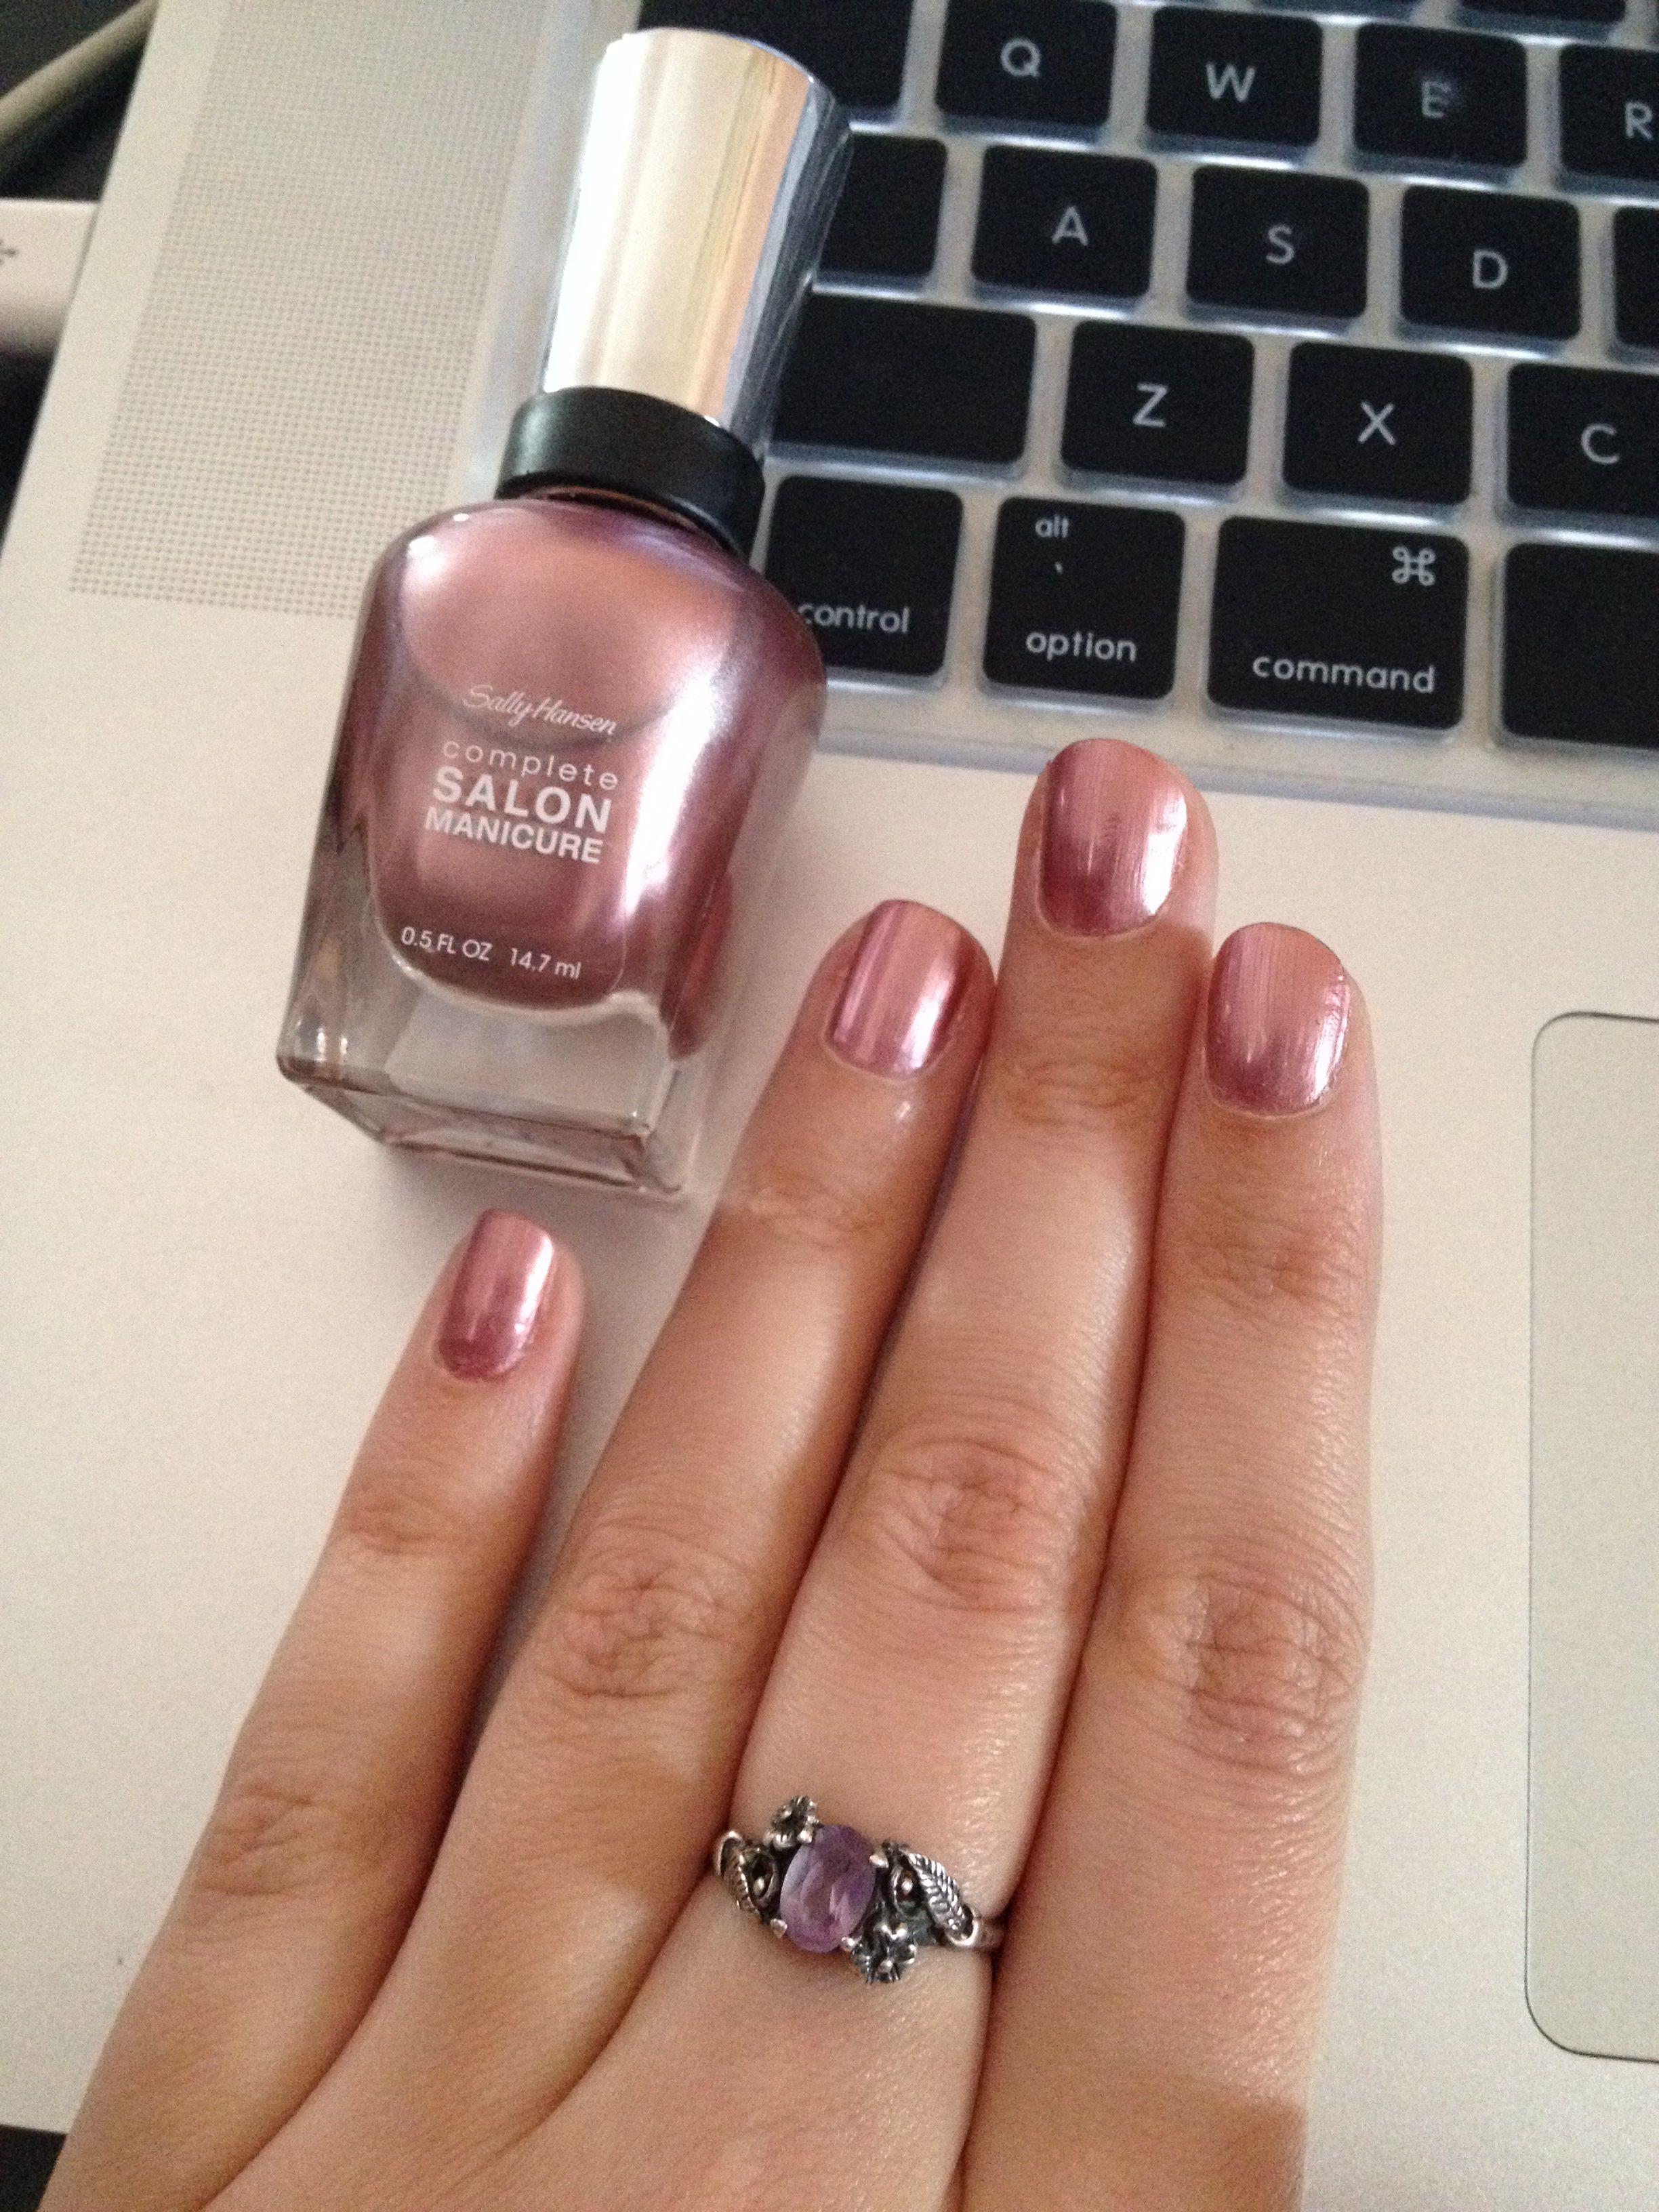 Sally Hansen Complete Salon Manicure Raisin The Bar Metallic Rose Color Gold Nails